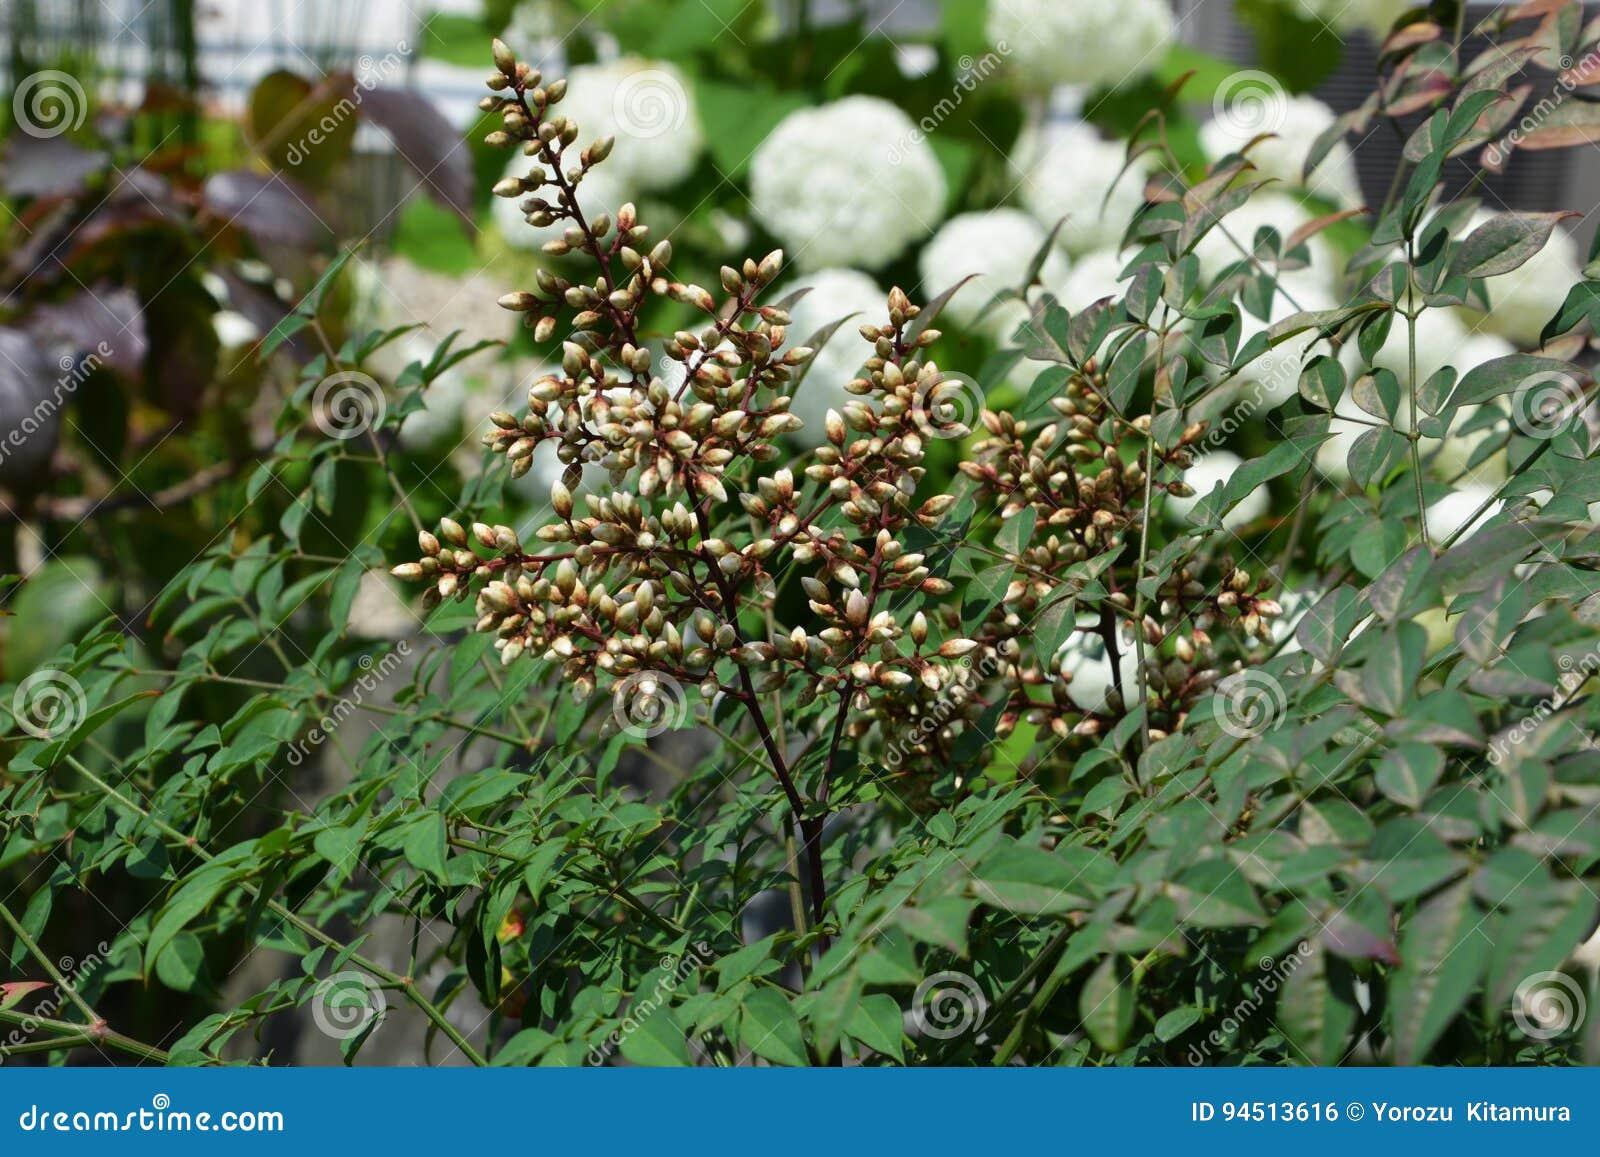 Flower Of Nandina Stock Photo Image Of White Fruits 94513616